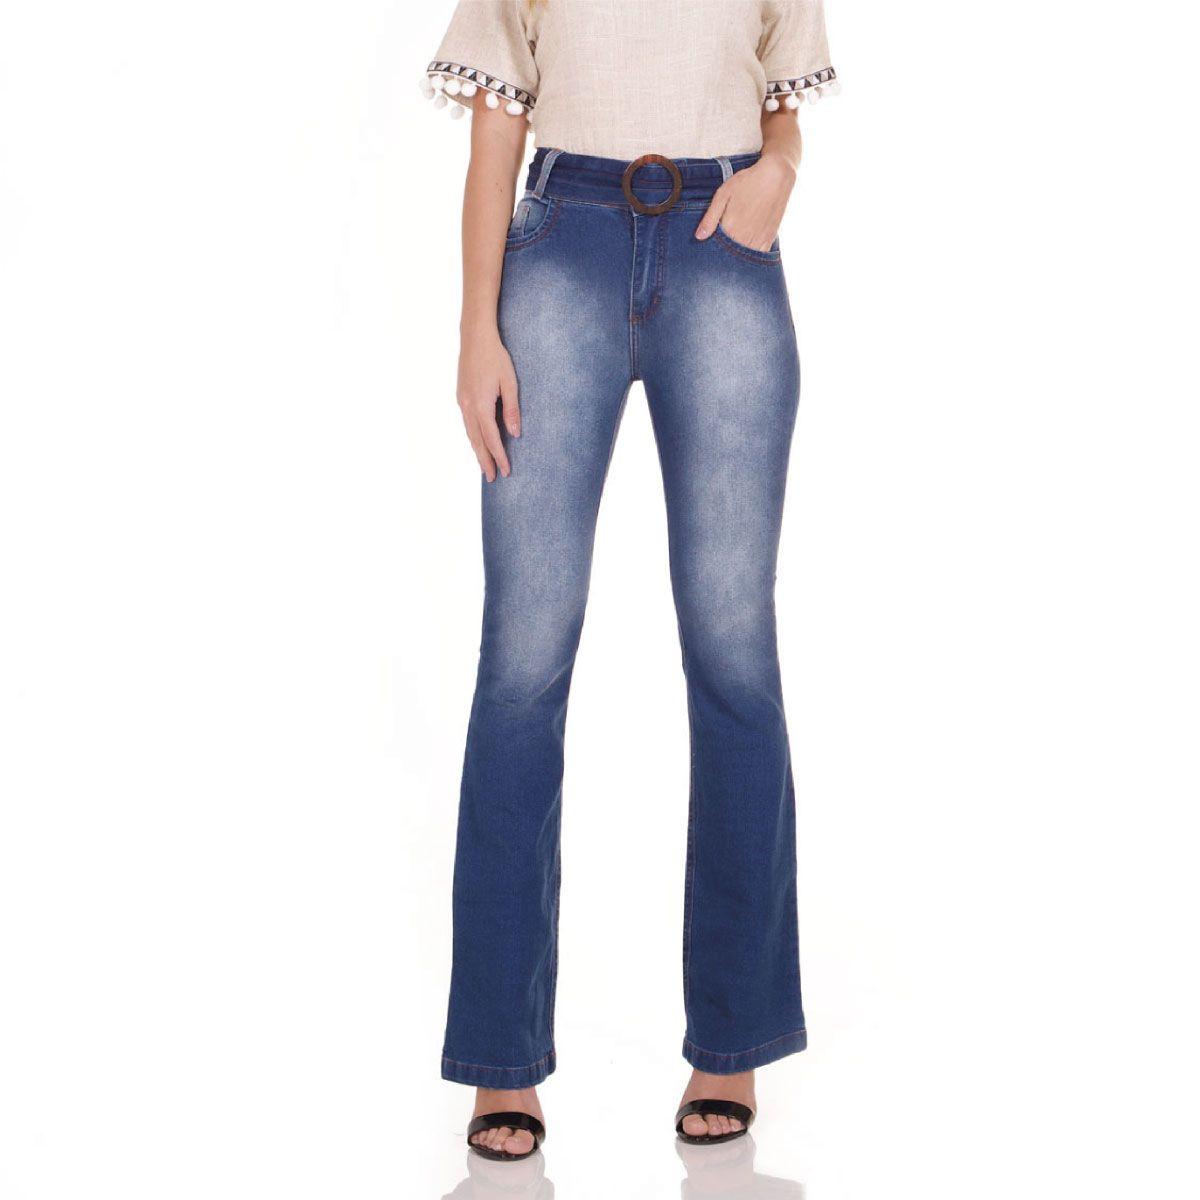 Calça Jeans Areazul Bootcut Feminina